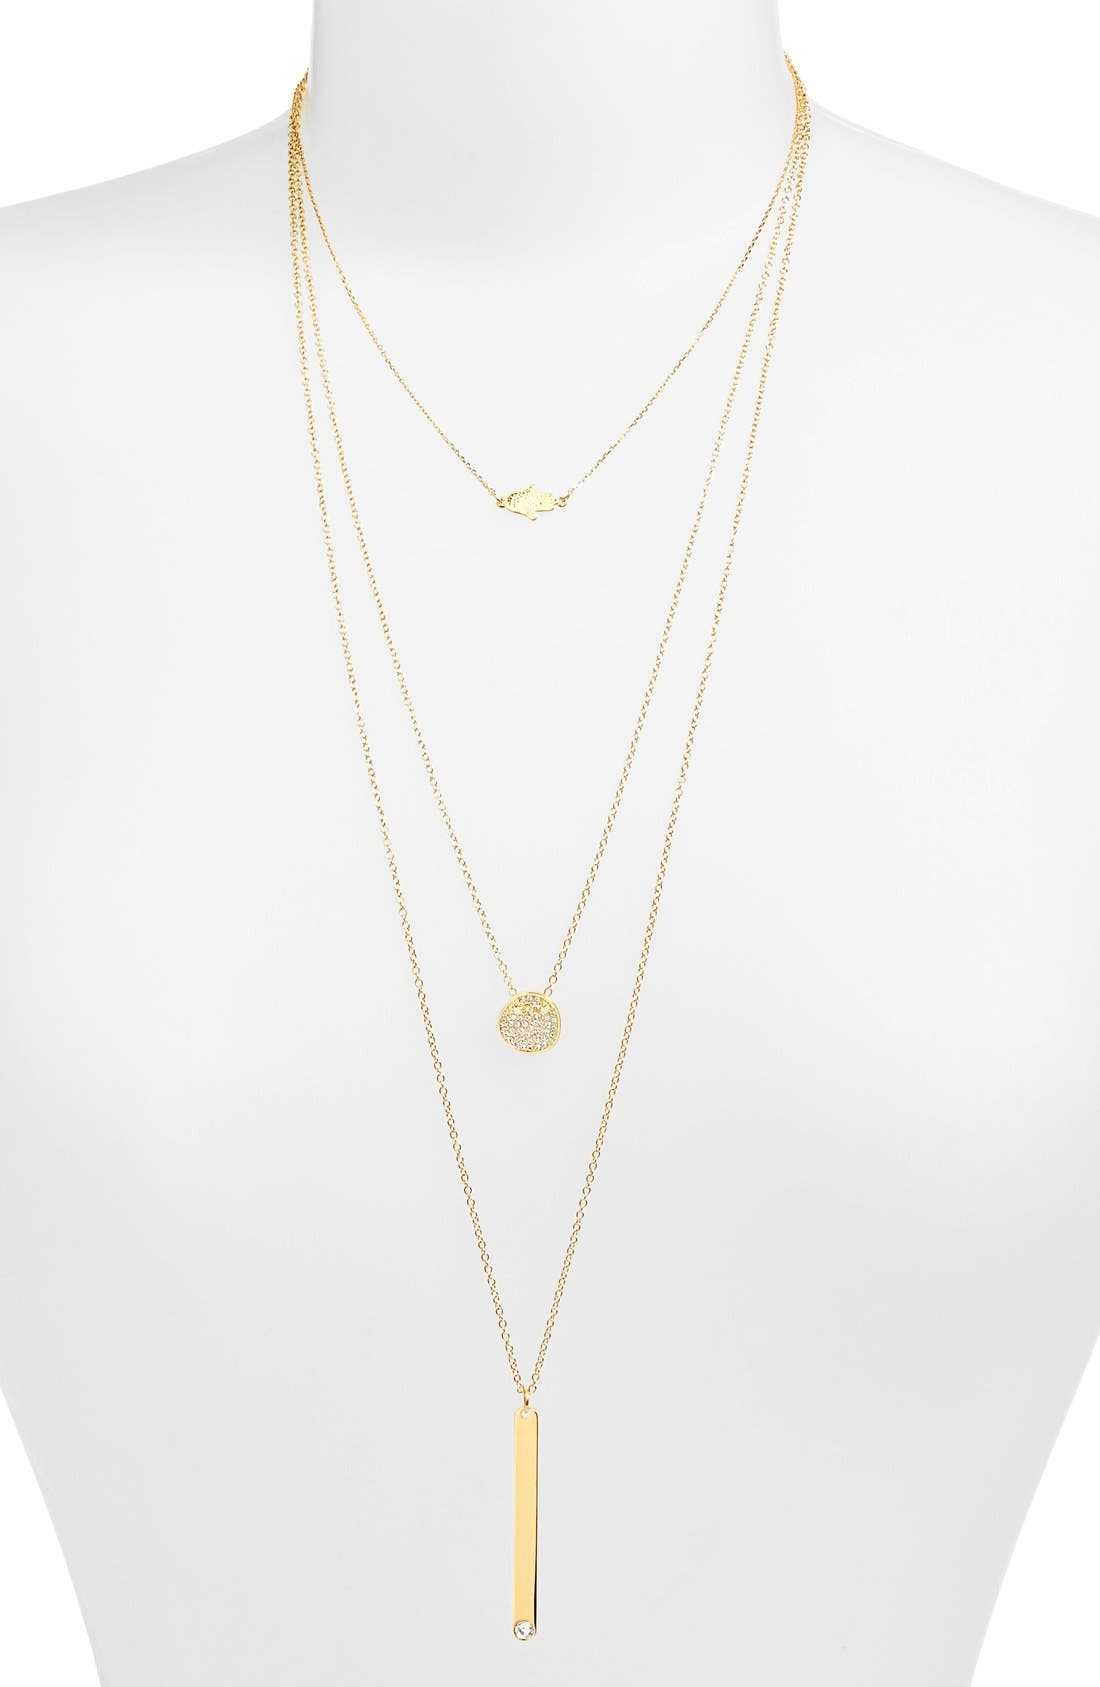 'Modern Metallics' 14k-Gold Plate Layered Necklace,                             Main thumbnail 1, color,